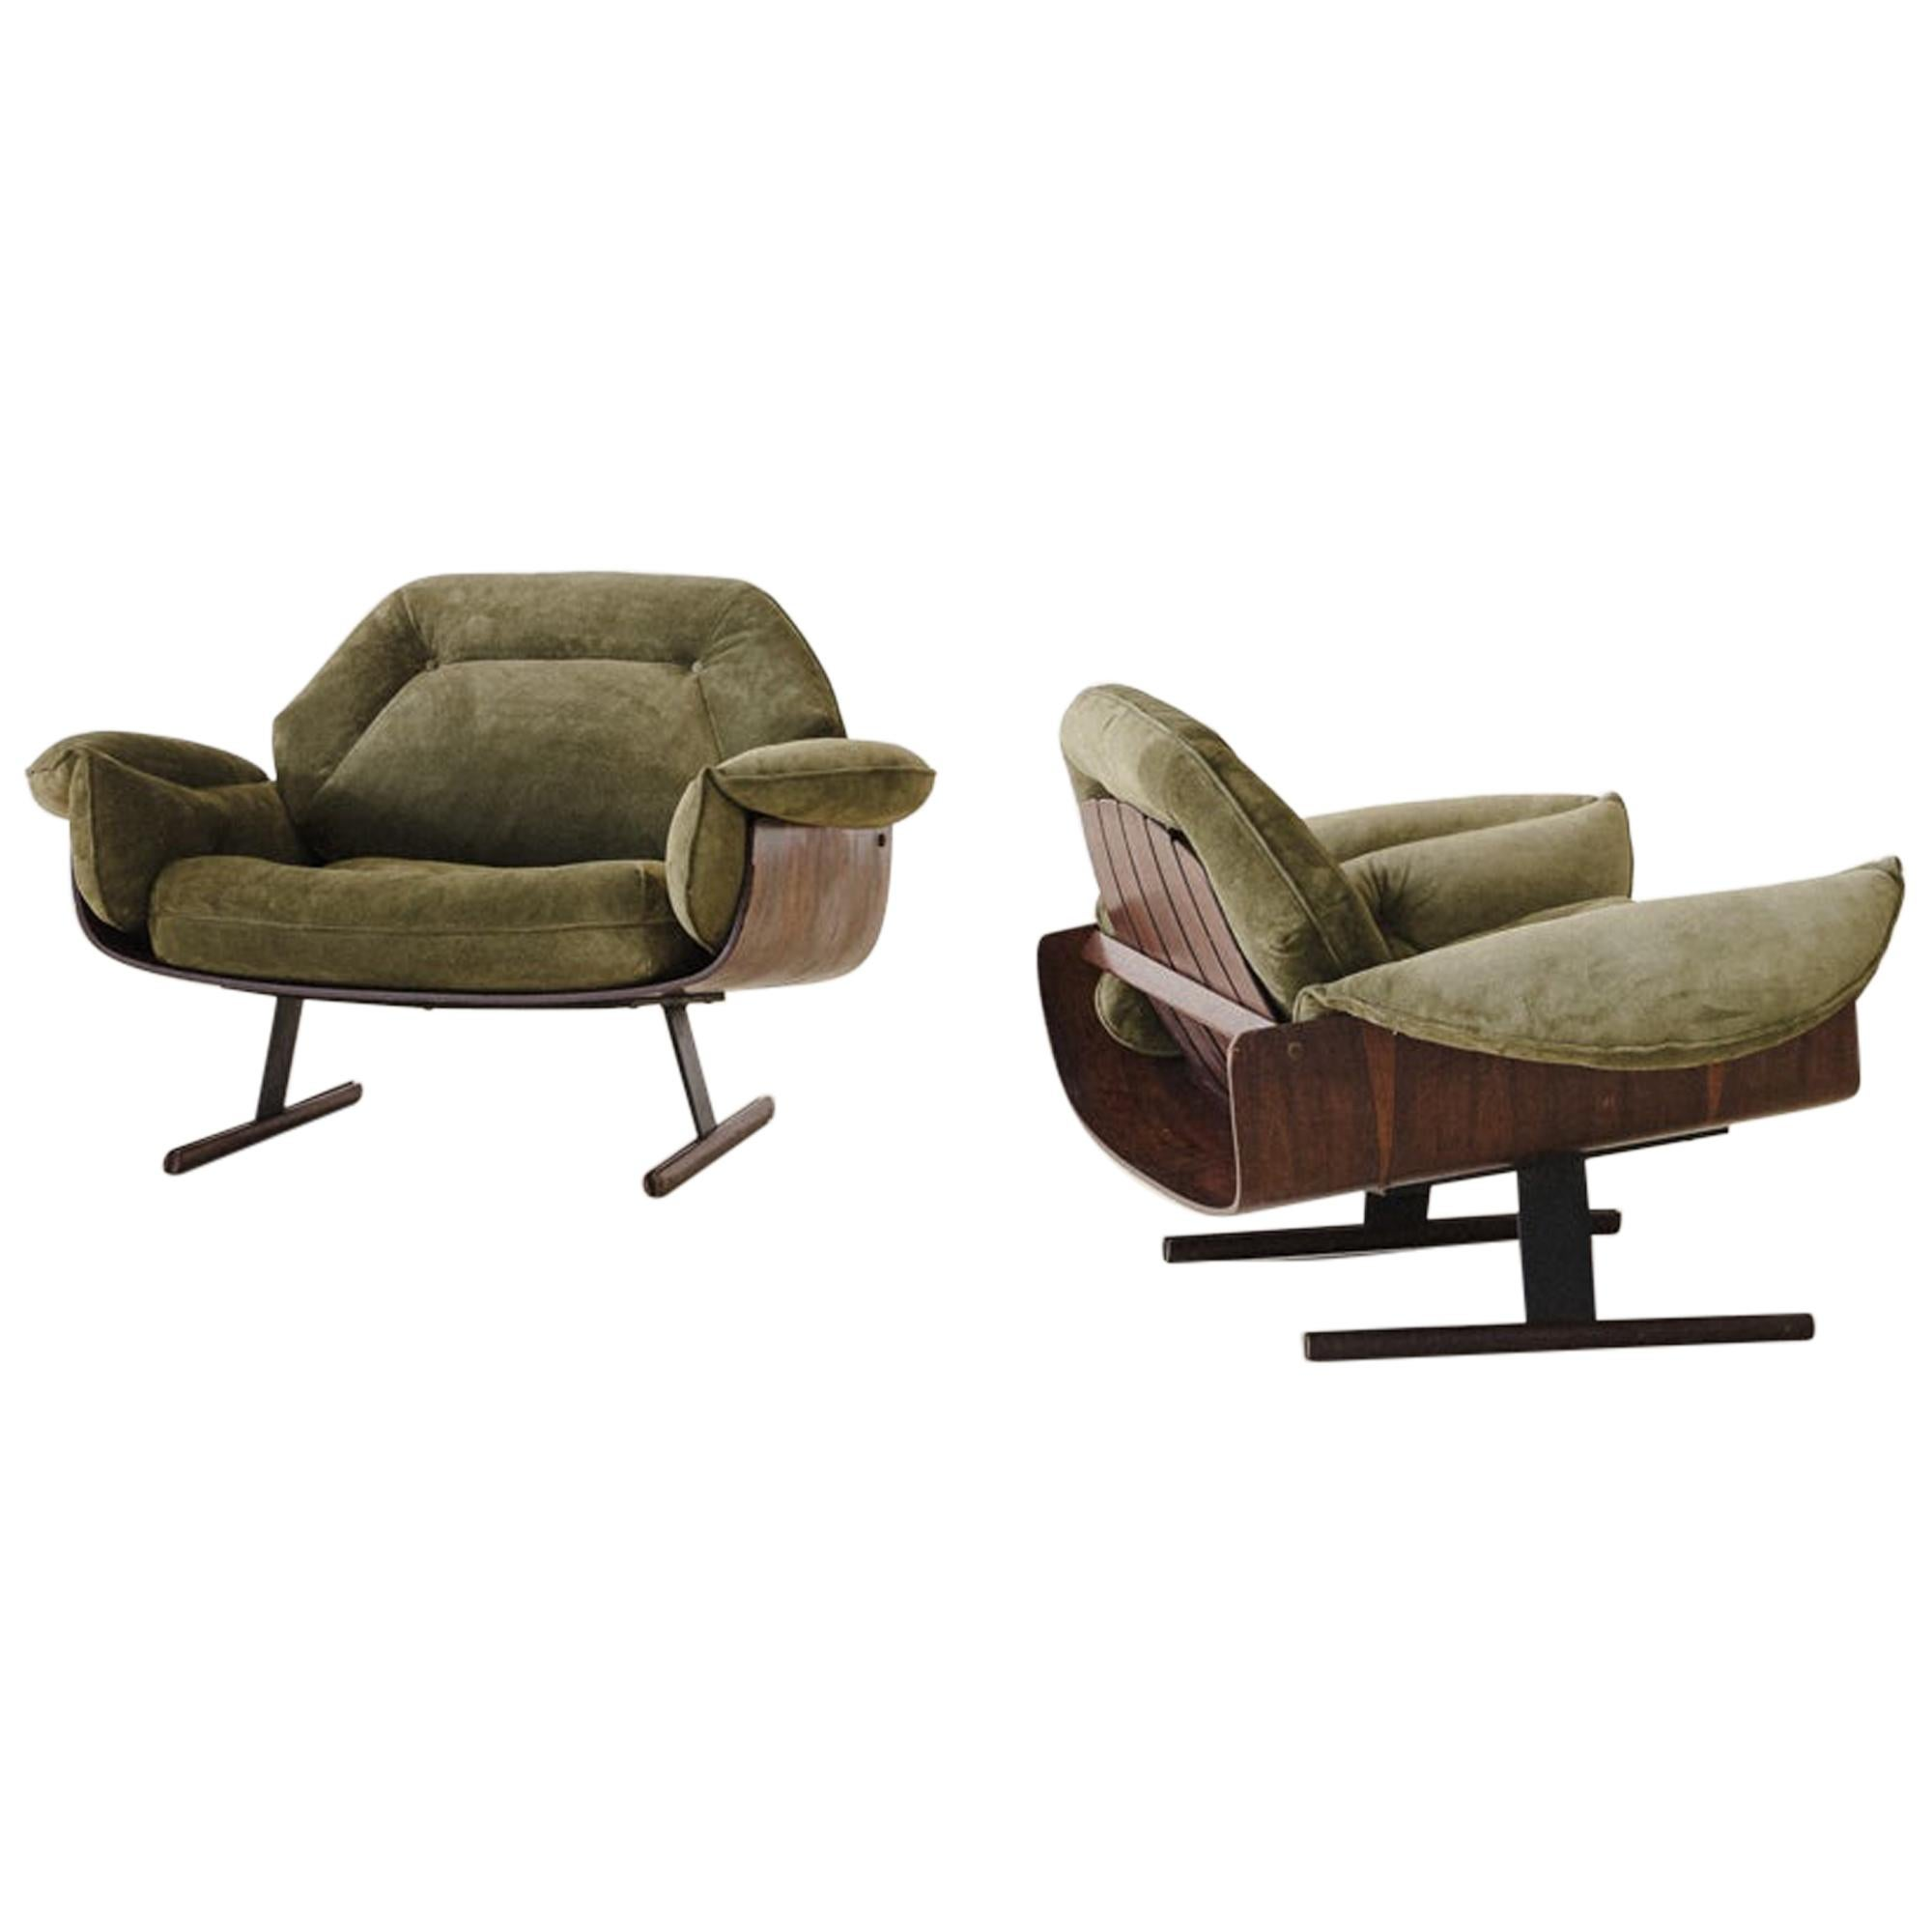 Mid-Century Modern Presidencial Armchair by Brazilian Designer Jorge Zalszupin